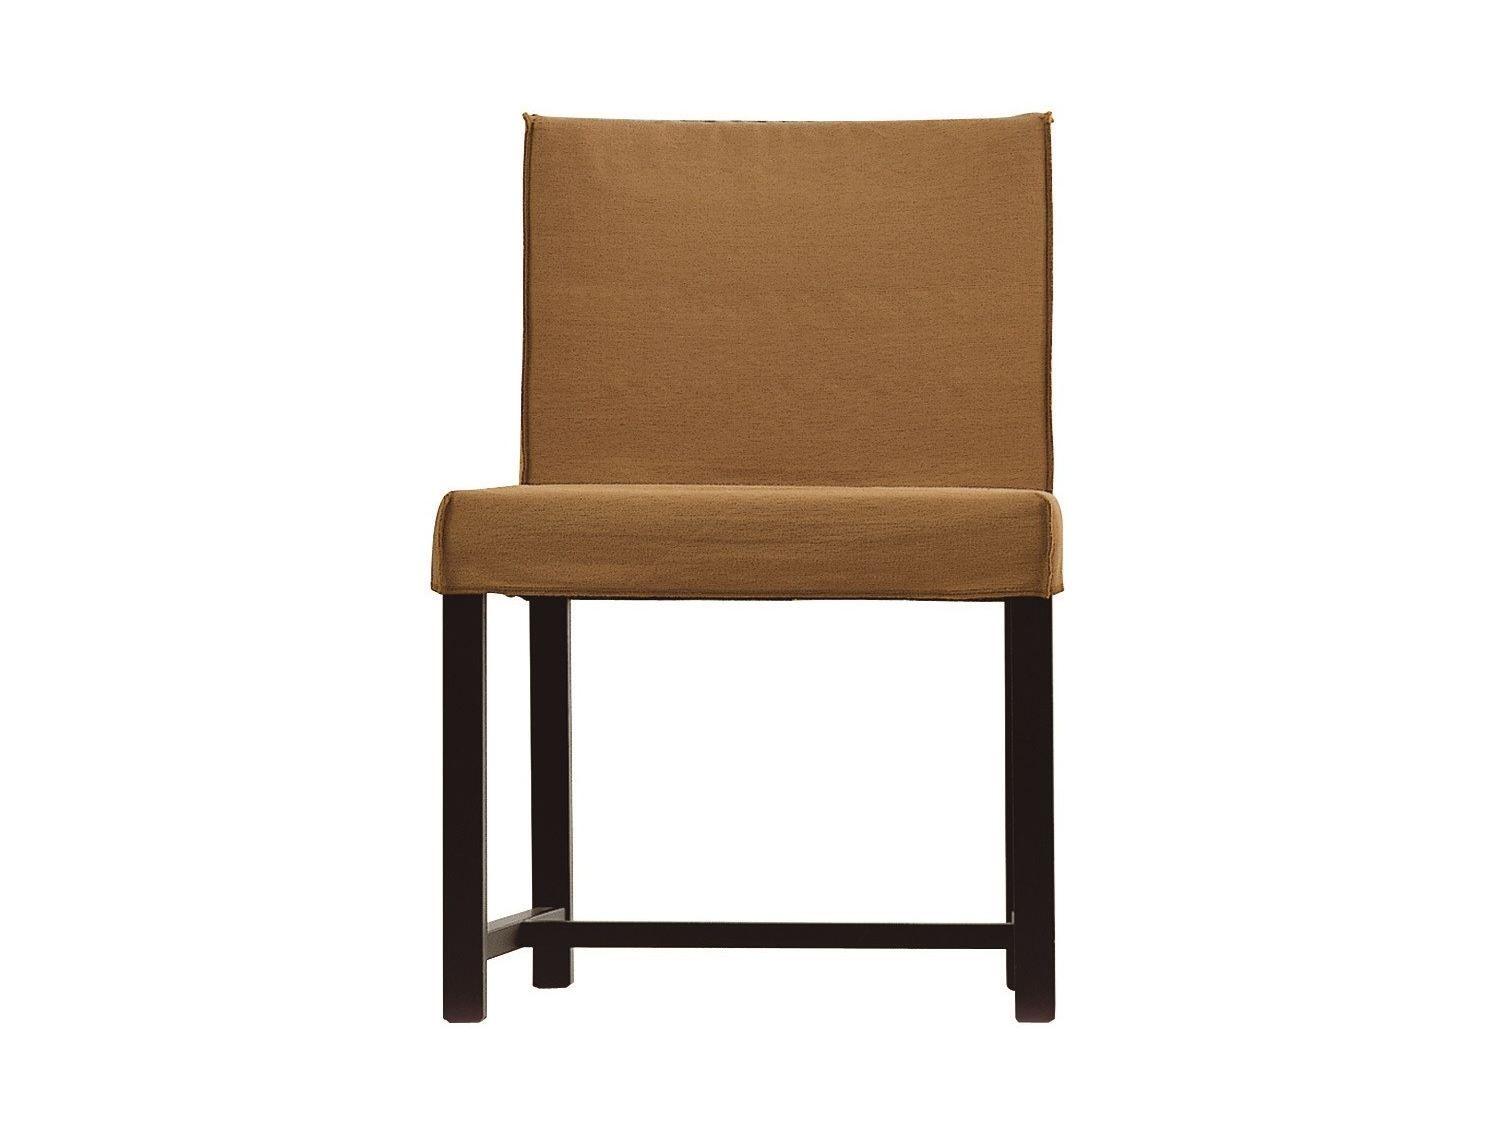 chaise avec rev tement amovible otto 125 by gervasoni design paola navone. Black Bedroom Furniture Sets. Home Design Ideas